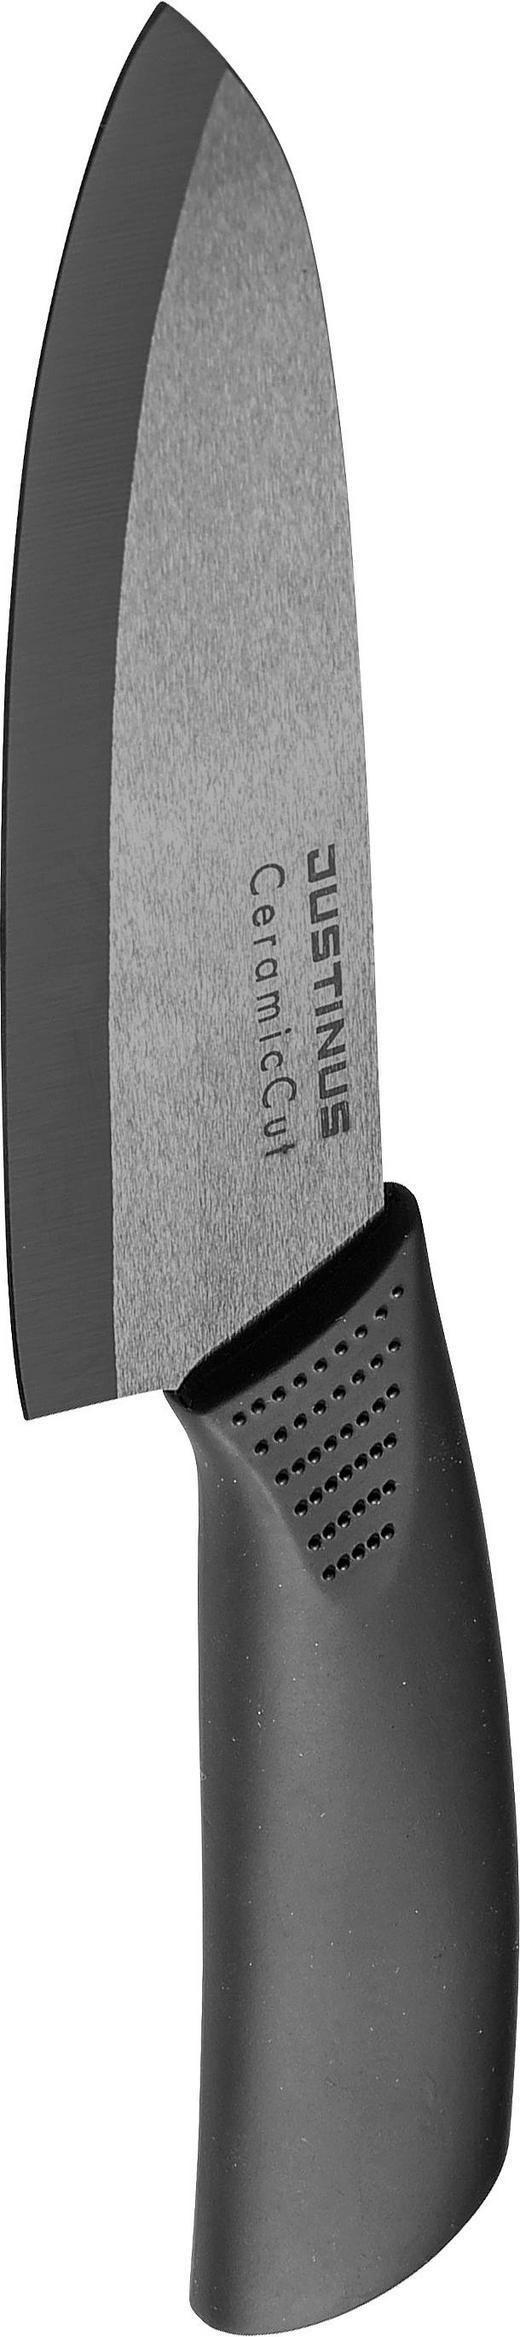 KUHINJSKI NOŽ 234940, 15 CM - črna, Konvencionalno, umetna masa/keramika (33cm) - Justinus